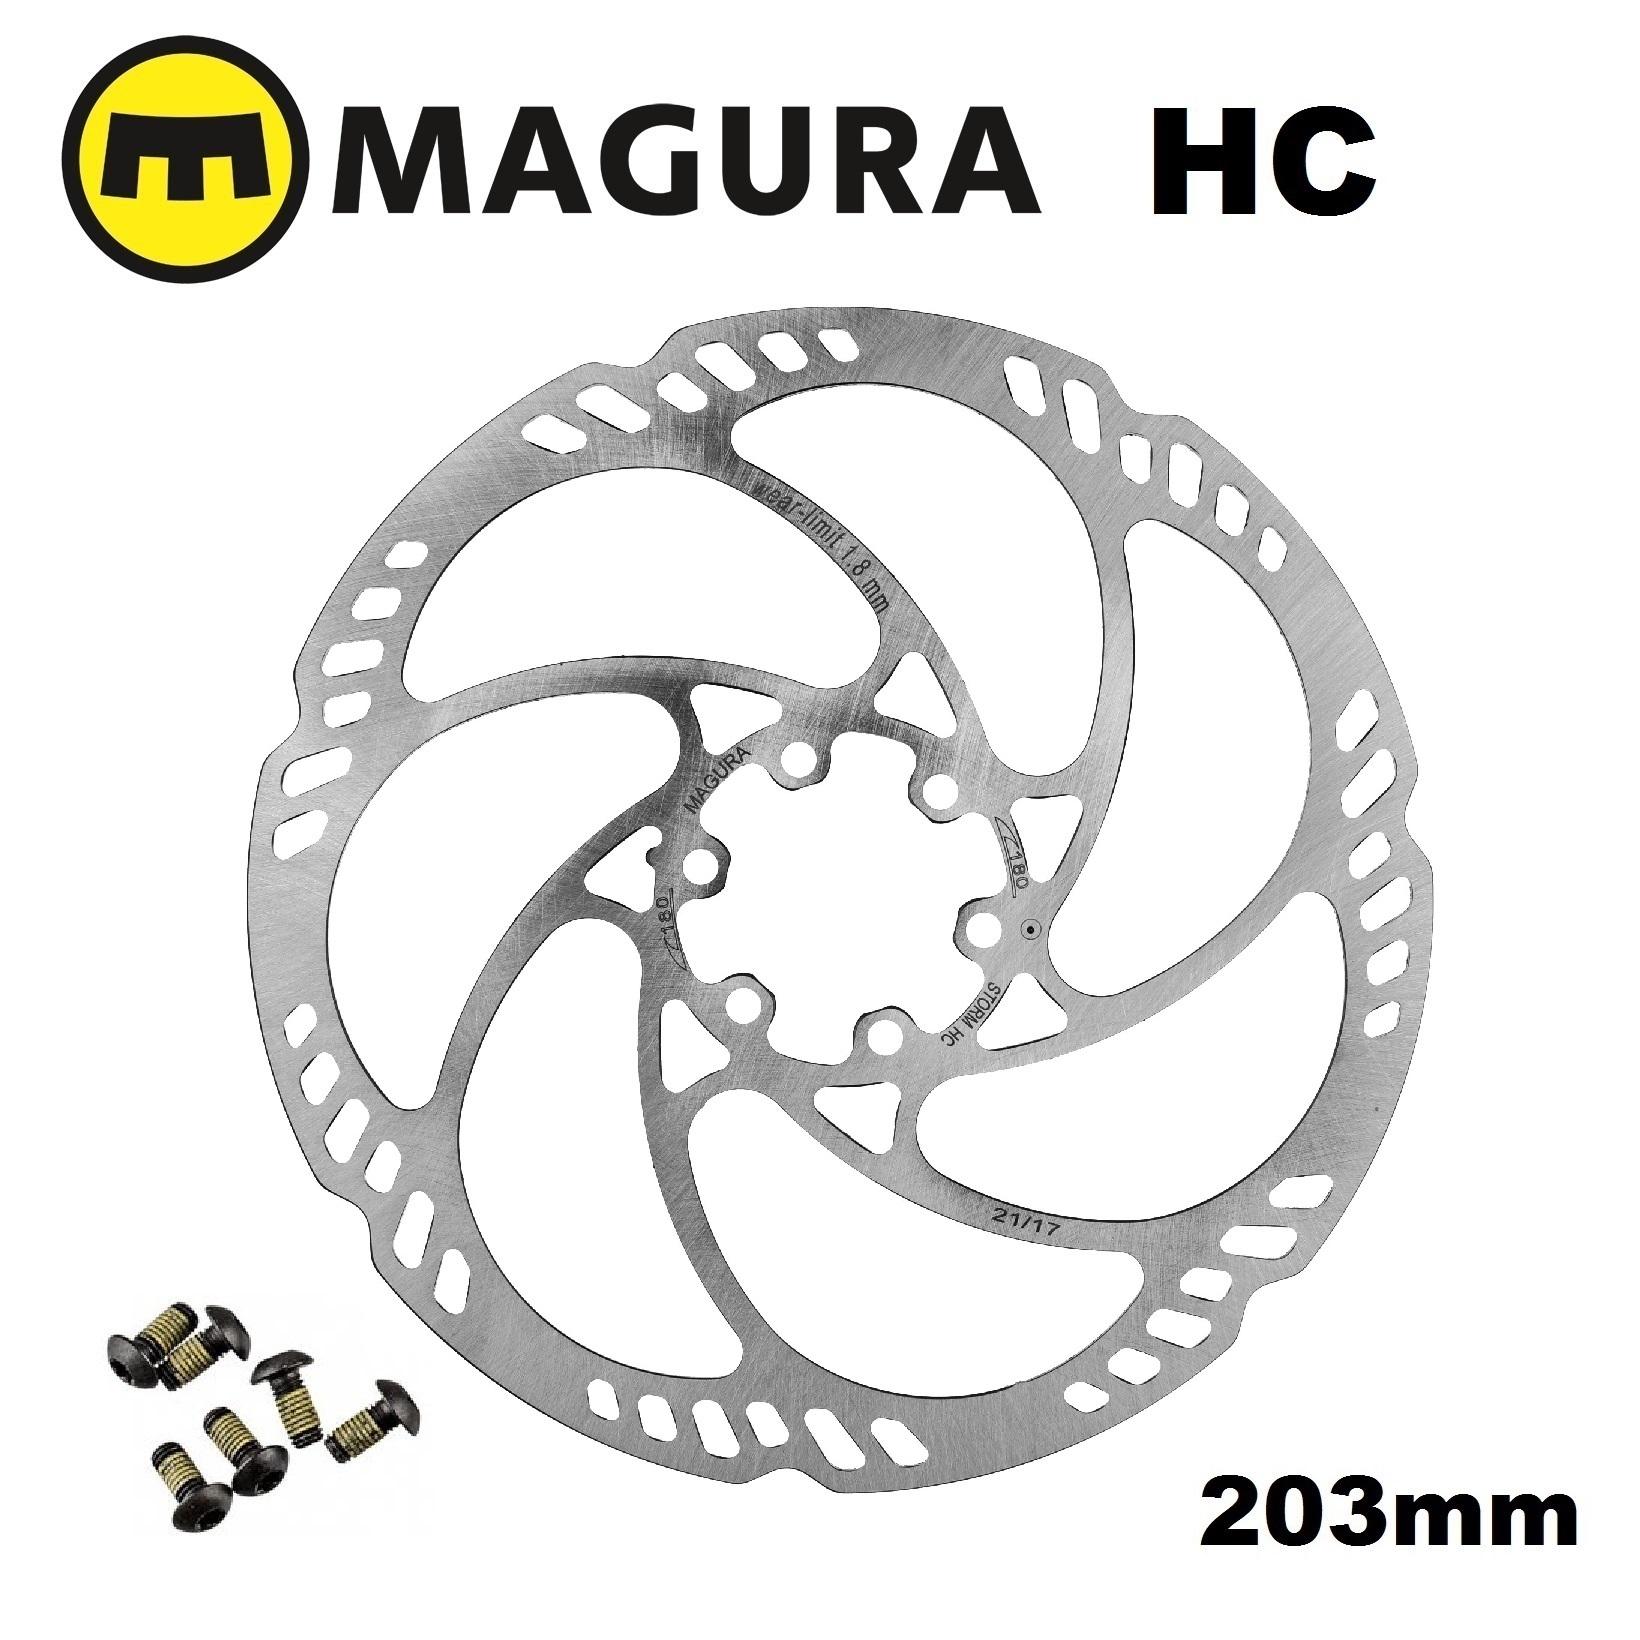 Magura Storm HC Rotor 203mm 6-Bolt